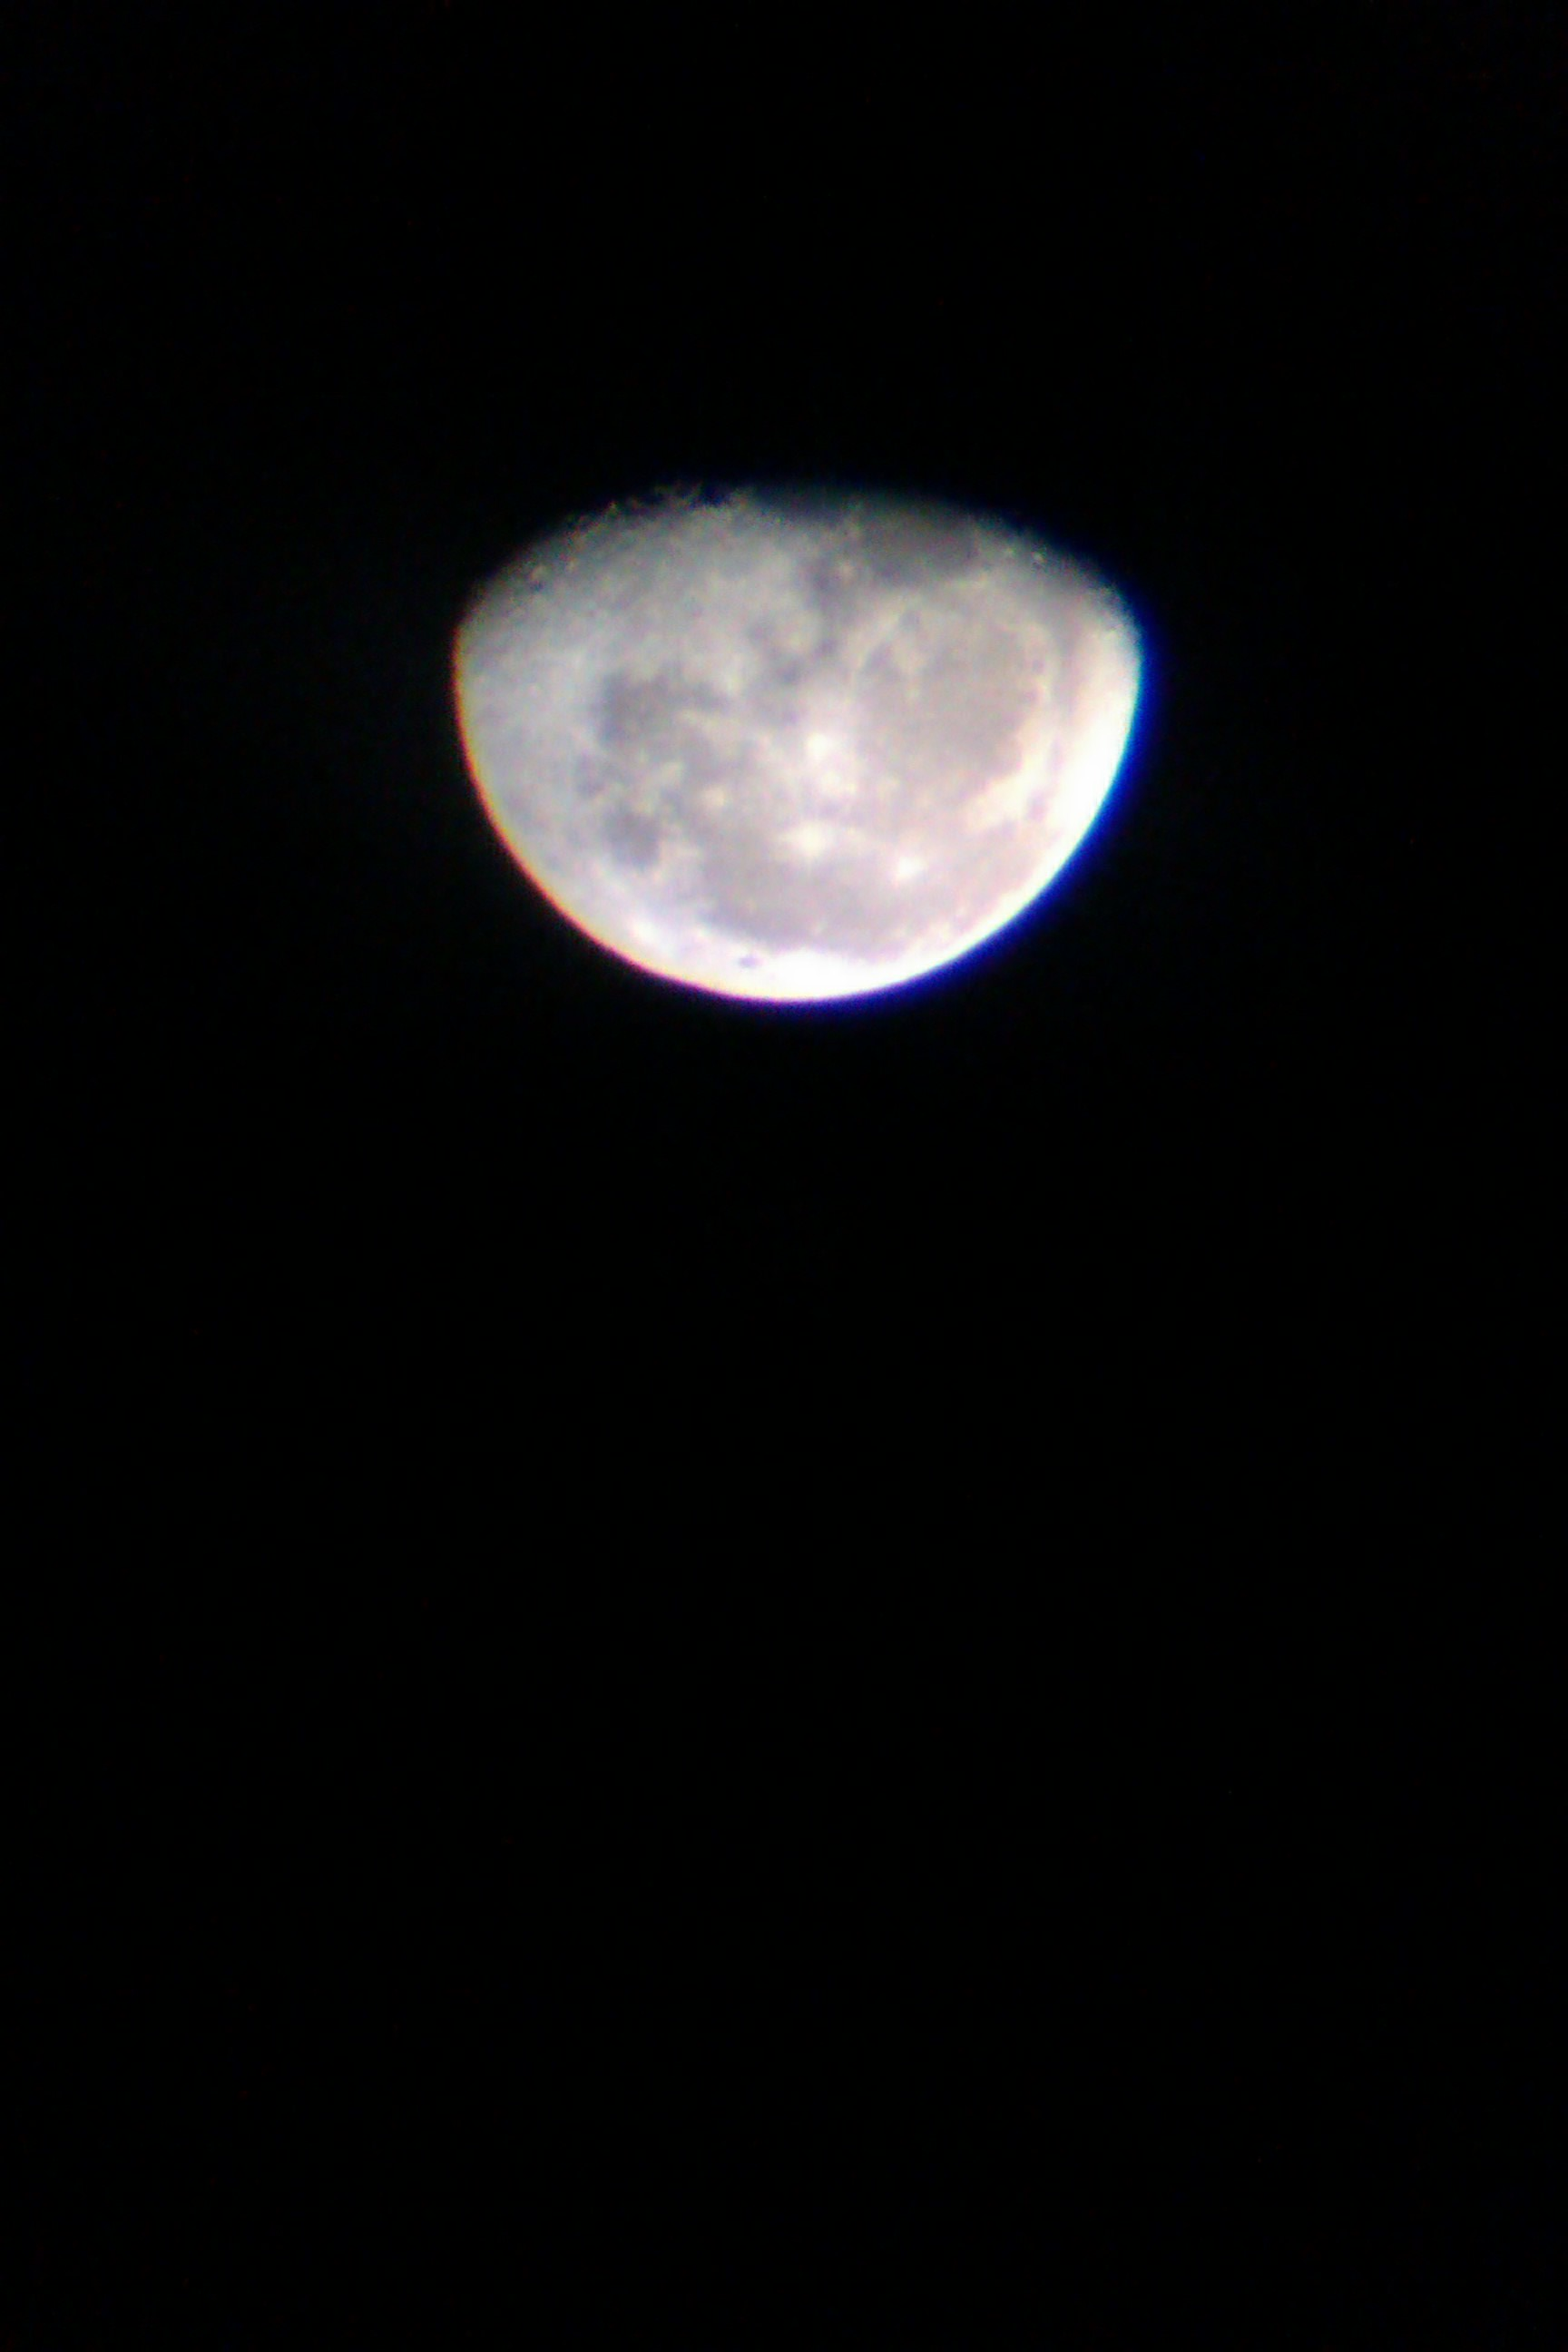 myblog.9e.cz/teleskop/M8.jpg